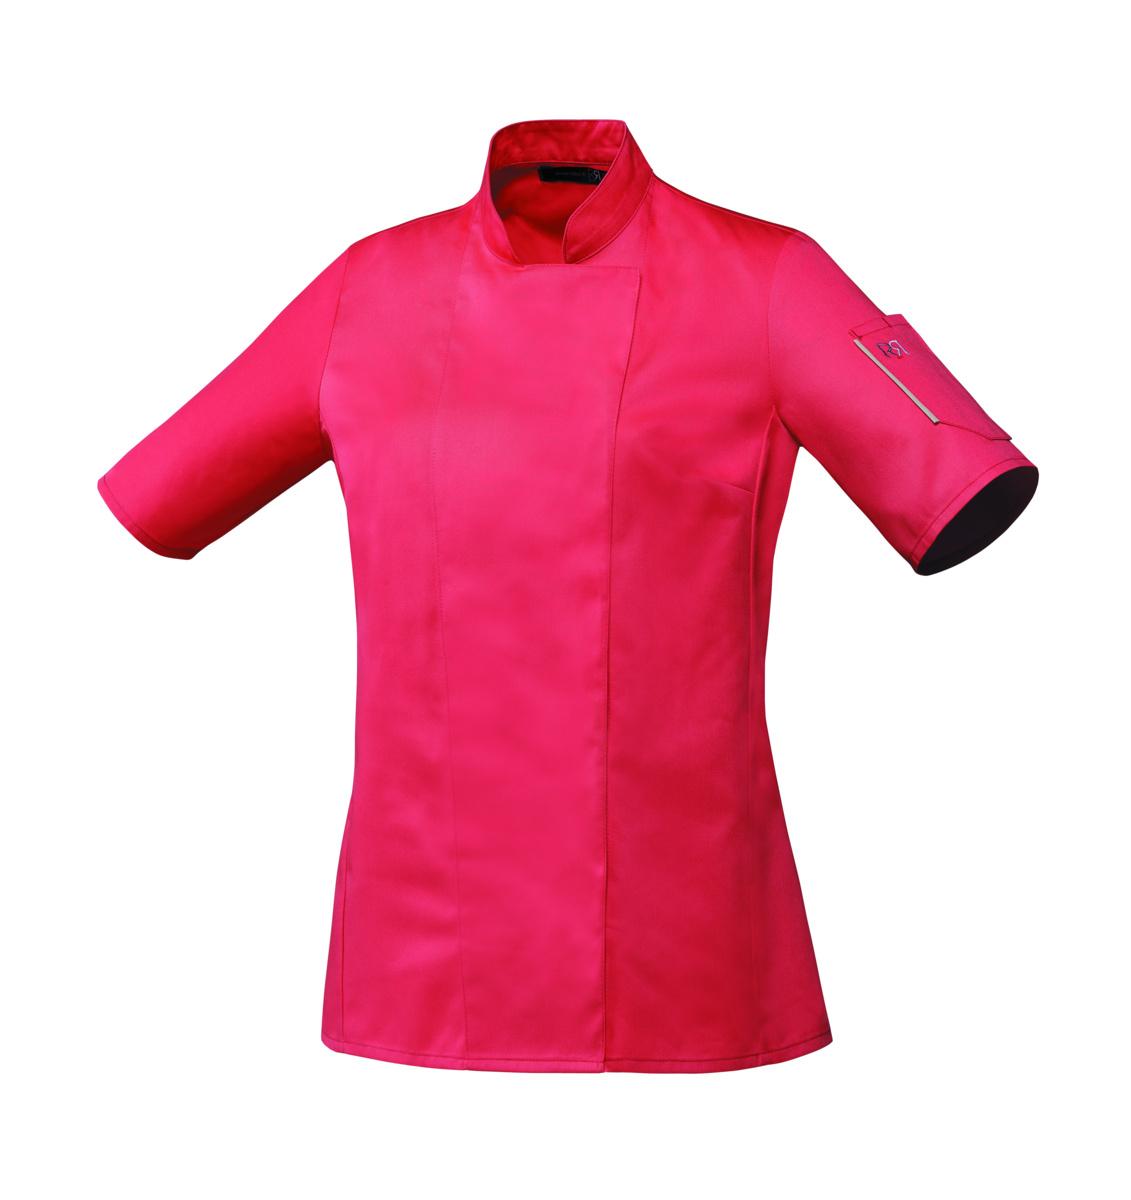 Veste femme rose taille 4 Unera Robur